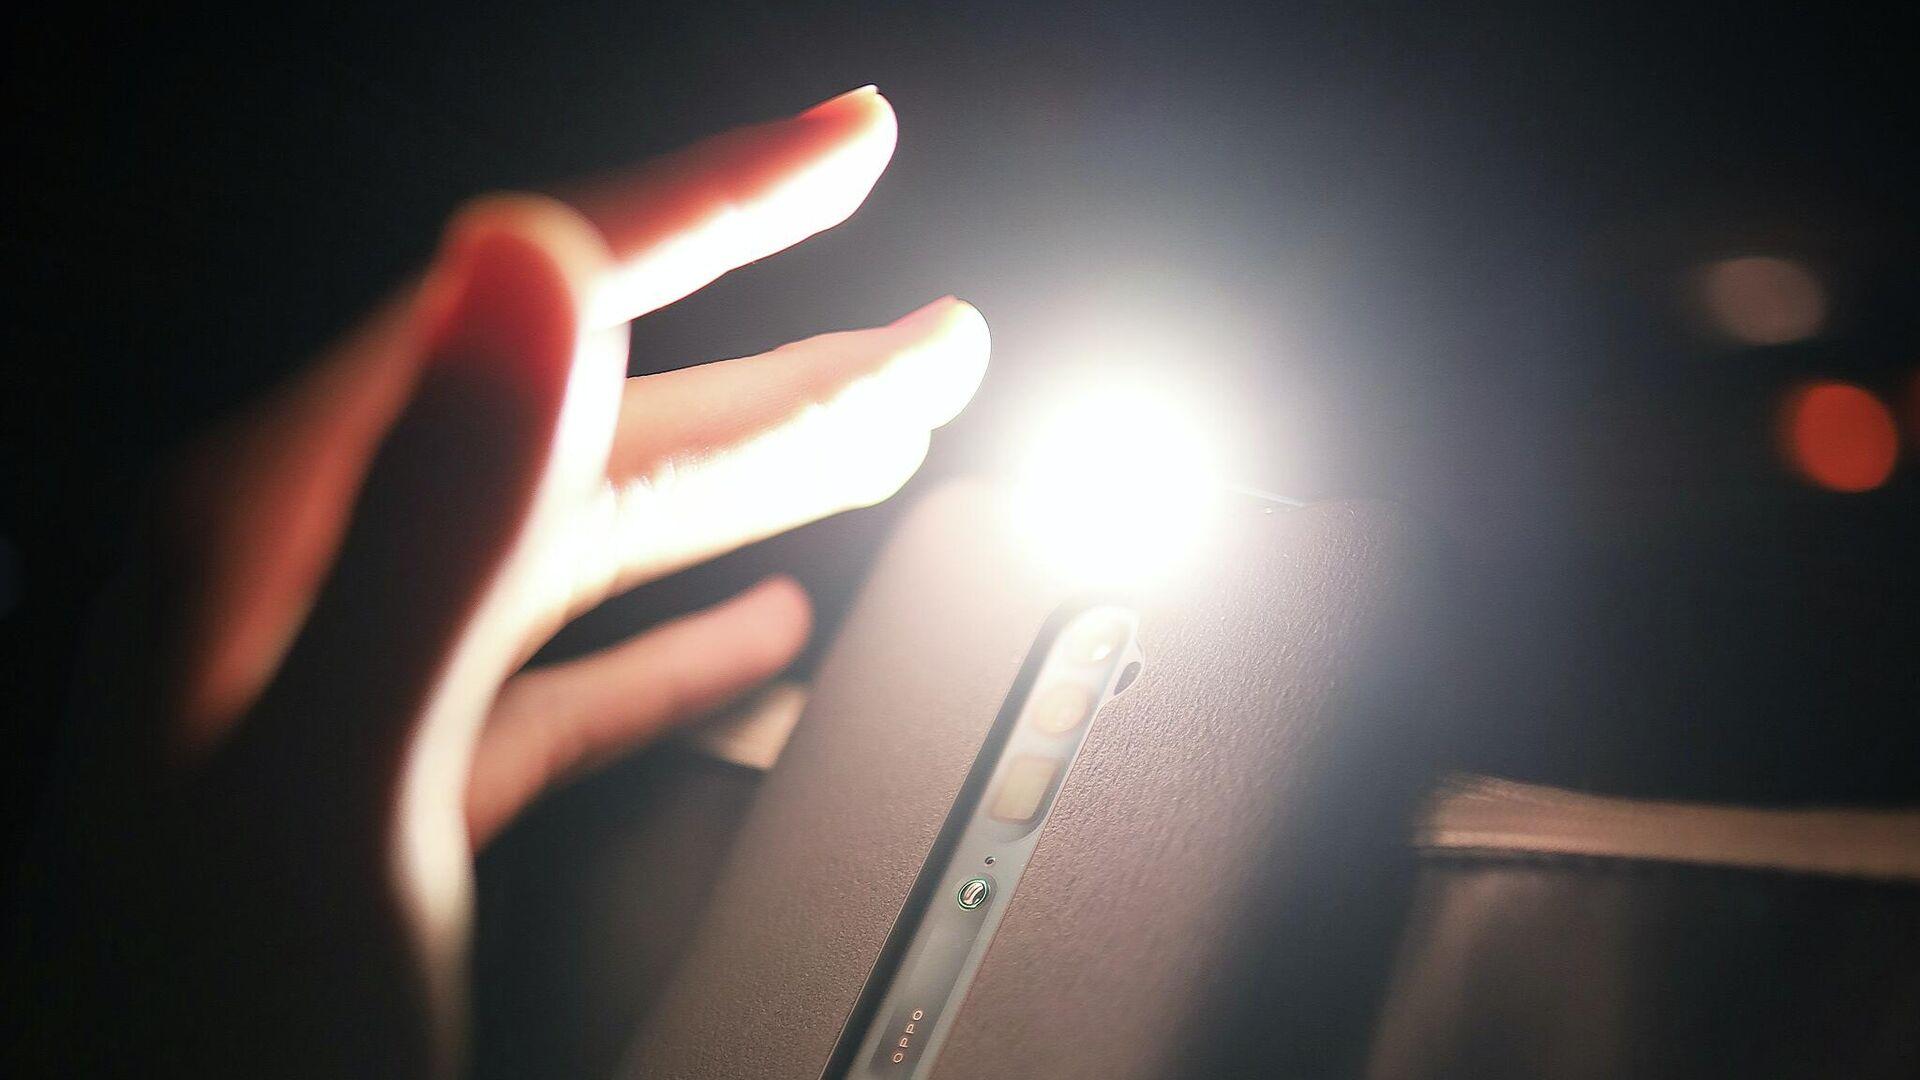 Una linterna en el smartphone - Sputnik Mundo, 1920, 12.02.2021